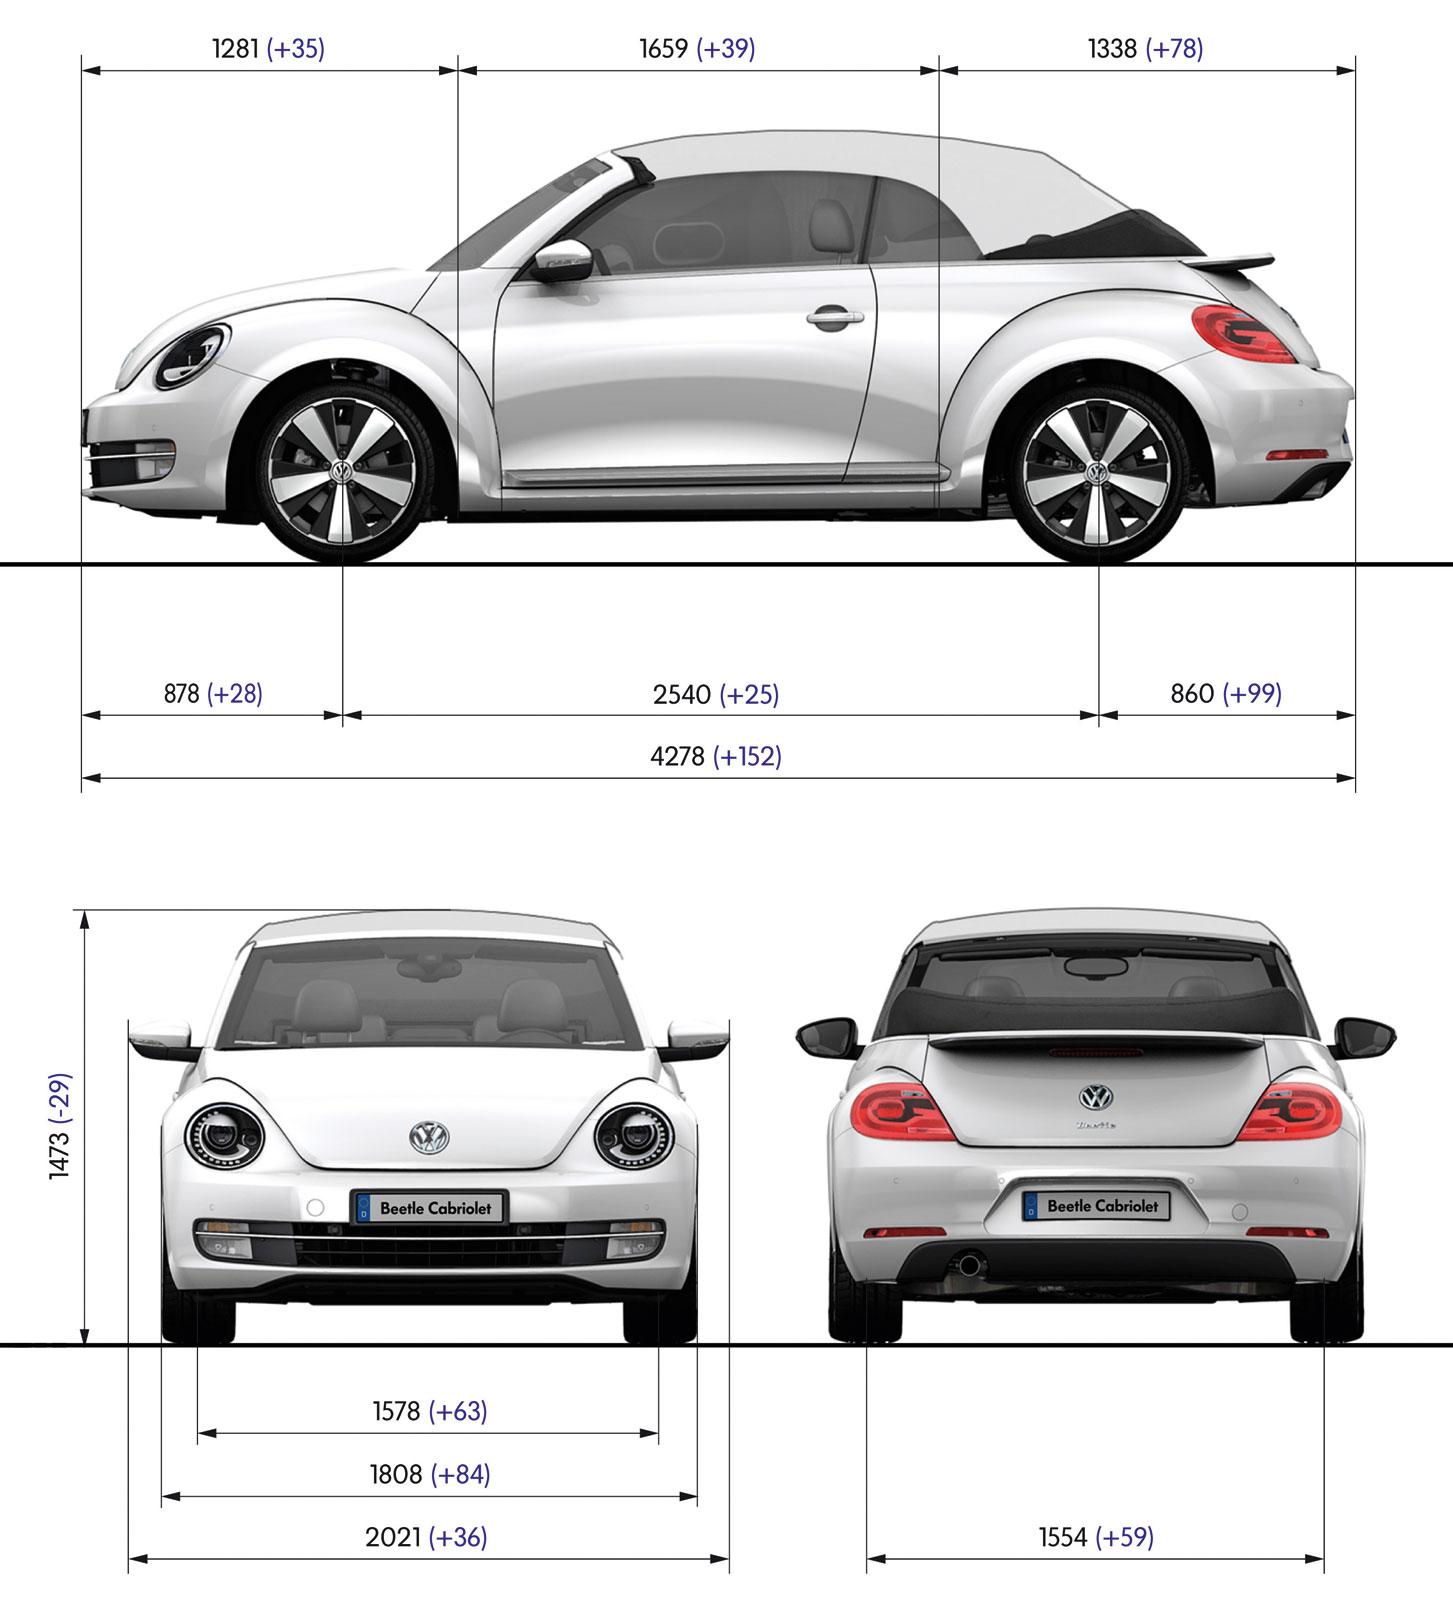 Volkswagen Beetle Cabriolet Blueprint Dimensions Car Body Design